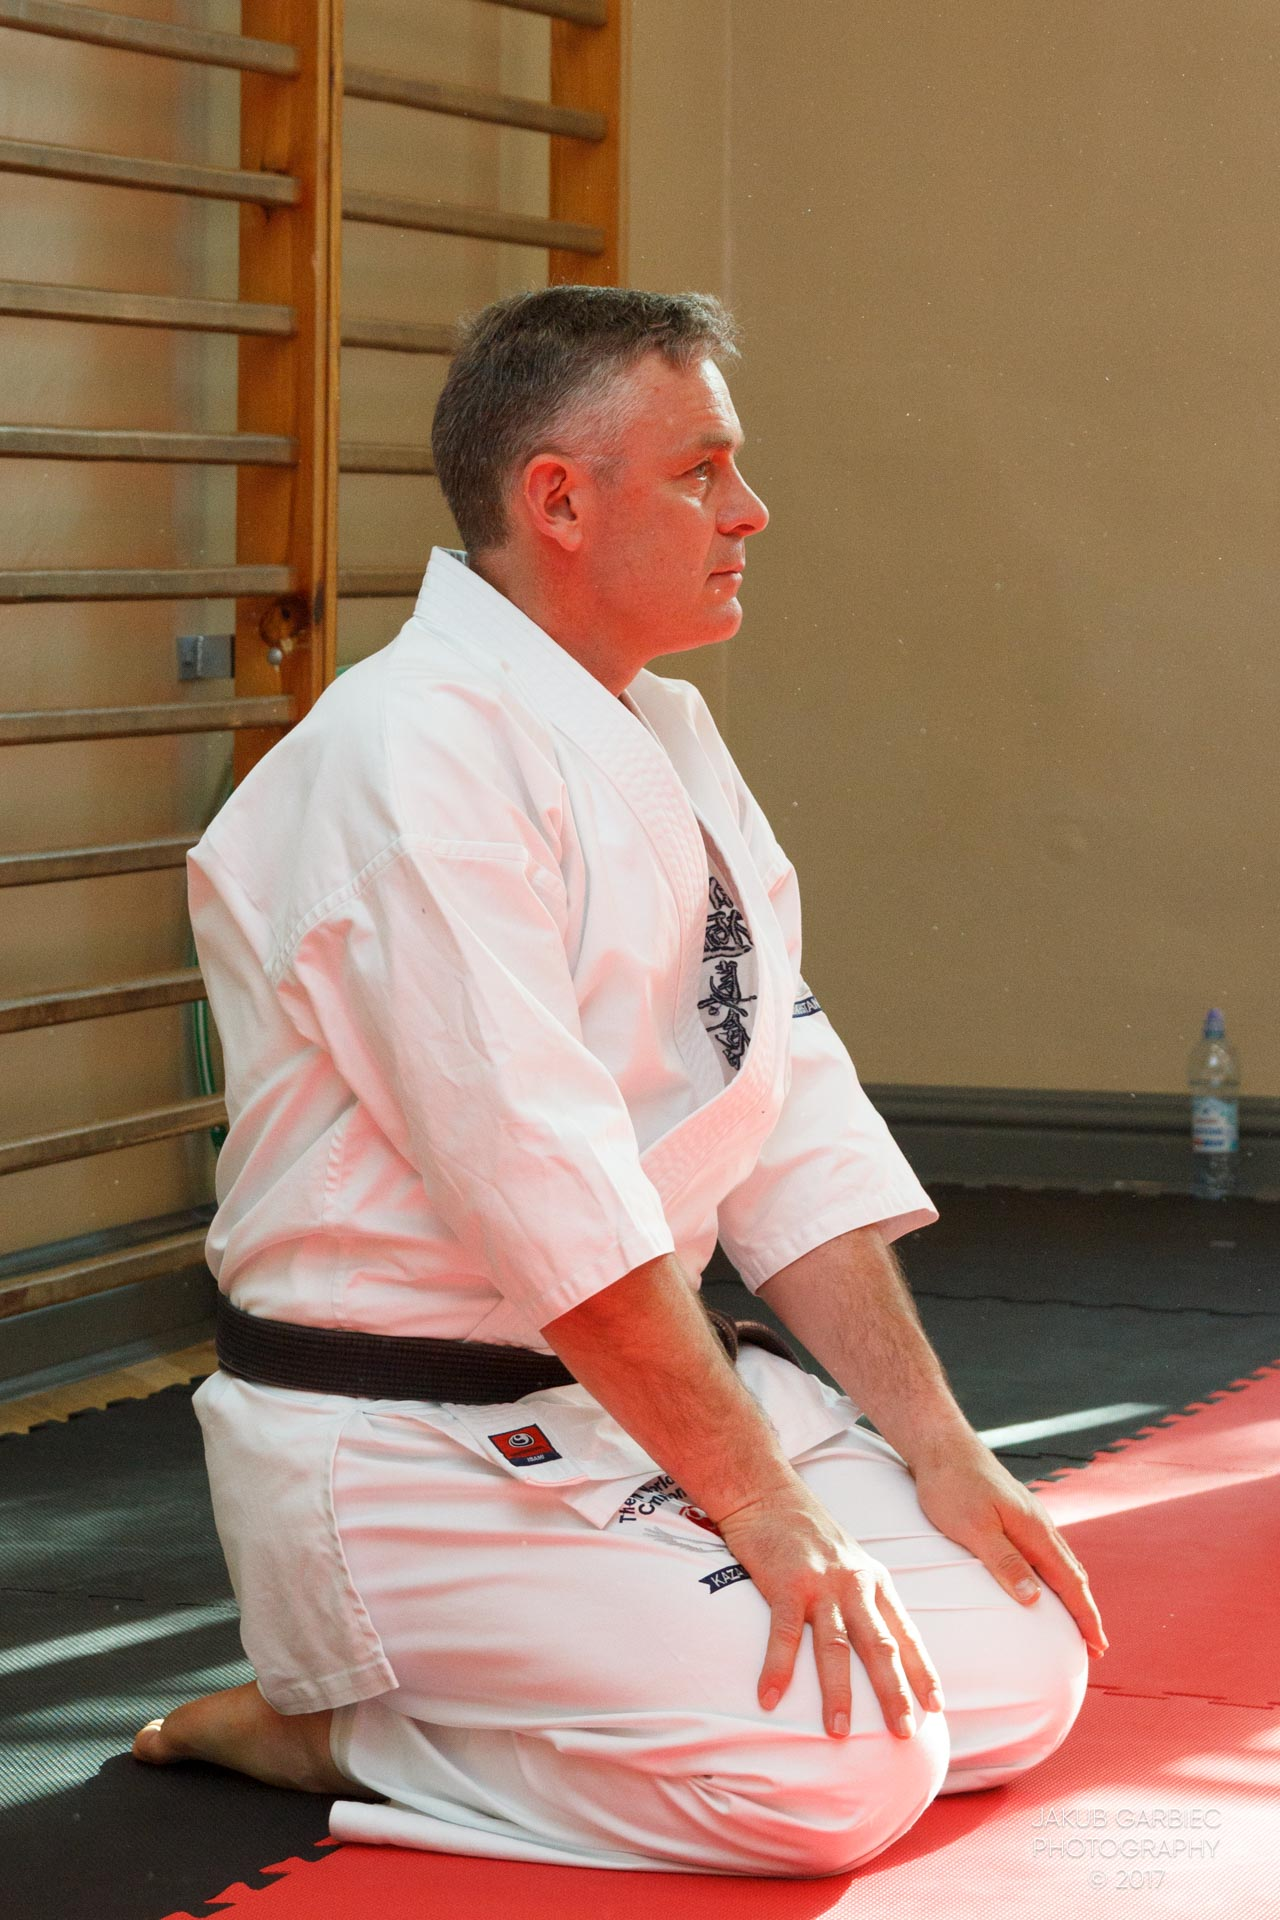 egzamin-karate-mistrz-mariusz-mazur-klub-karate-shodan-2017-06-02-5